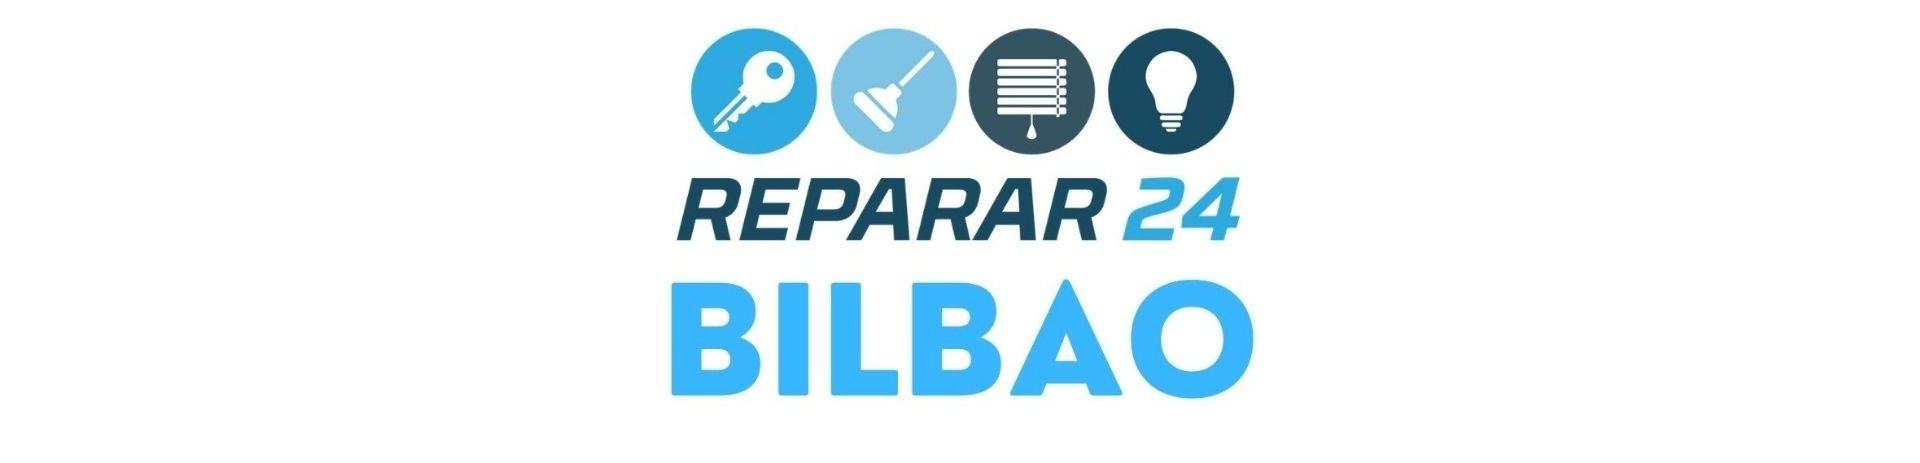 cerrajeros-en-bilbao-cerrajeros-Bilbao